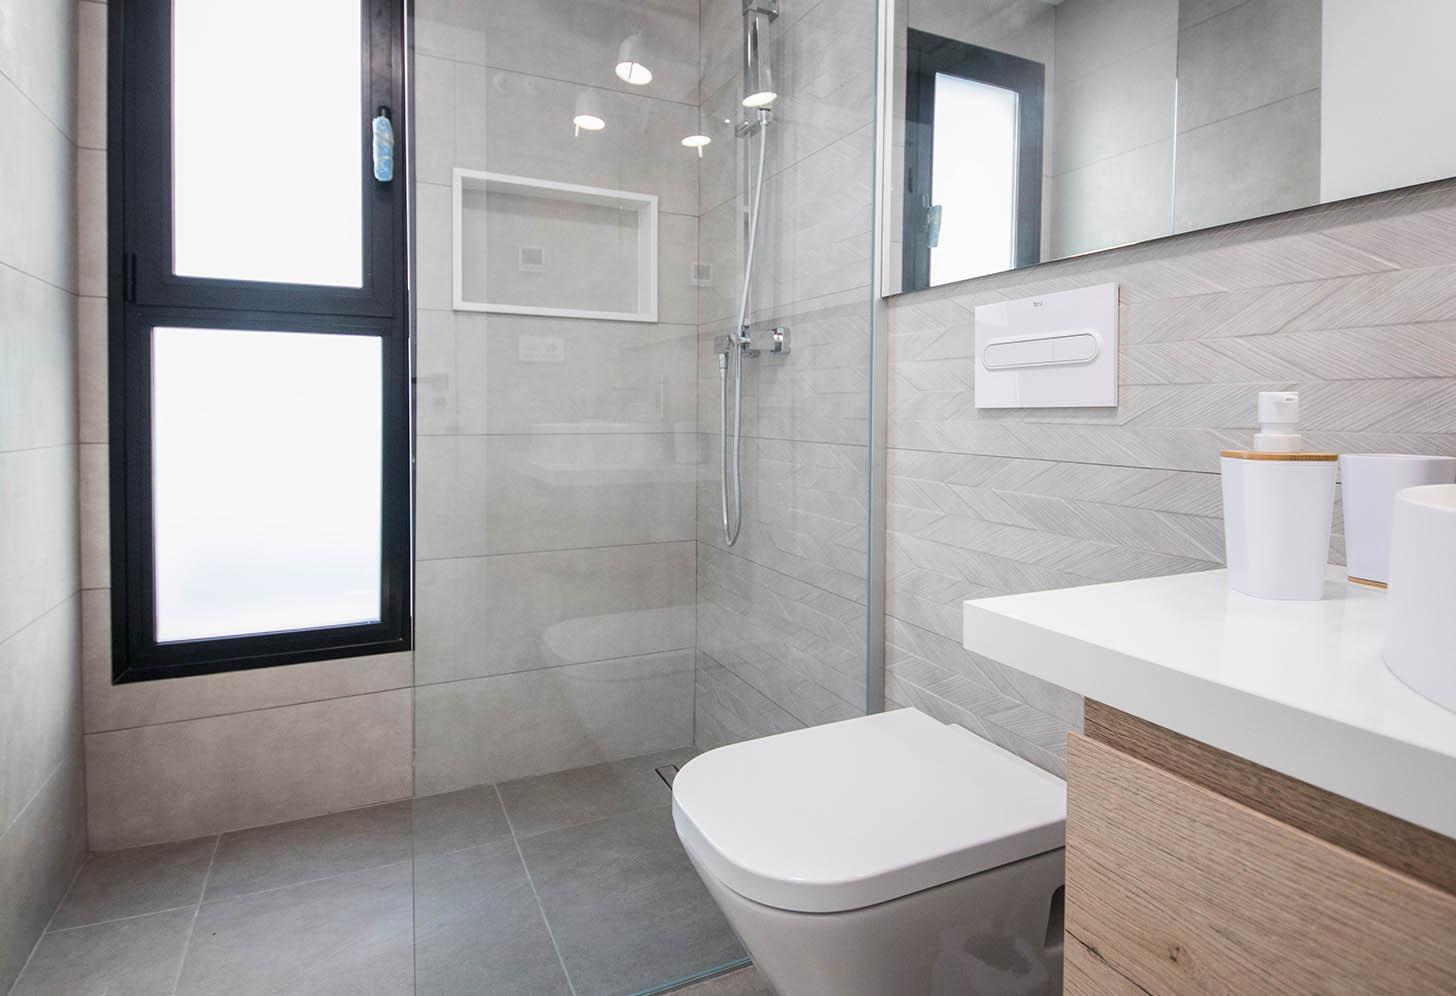 immobilier neuf espagne costa blanca sur murcia salle de bain 2